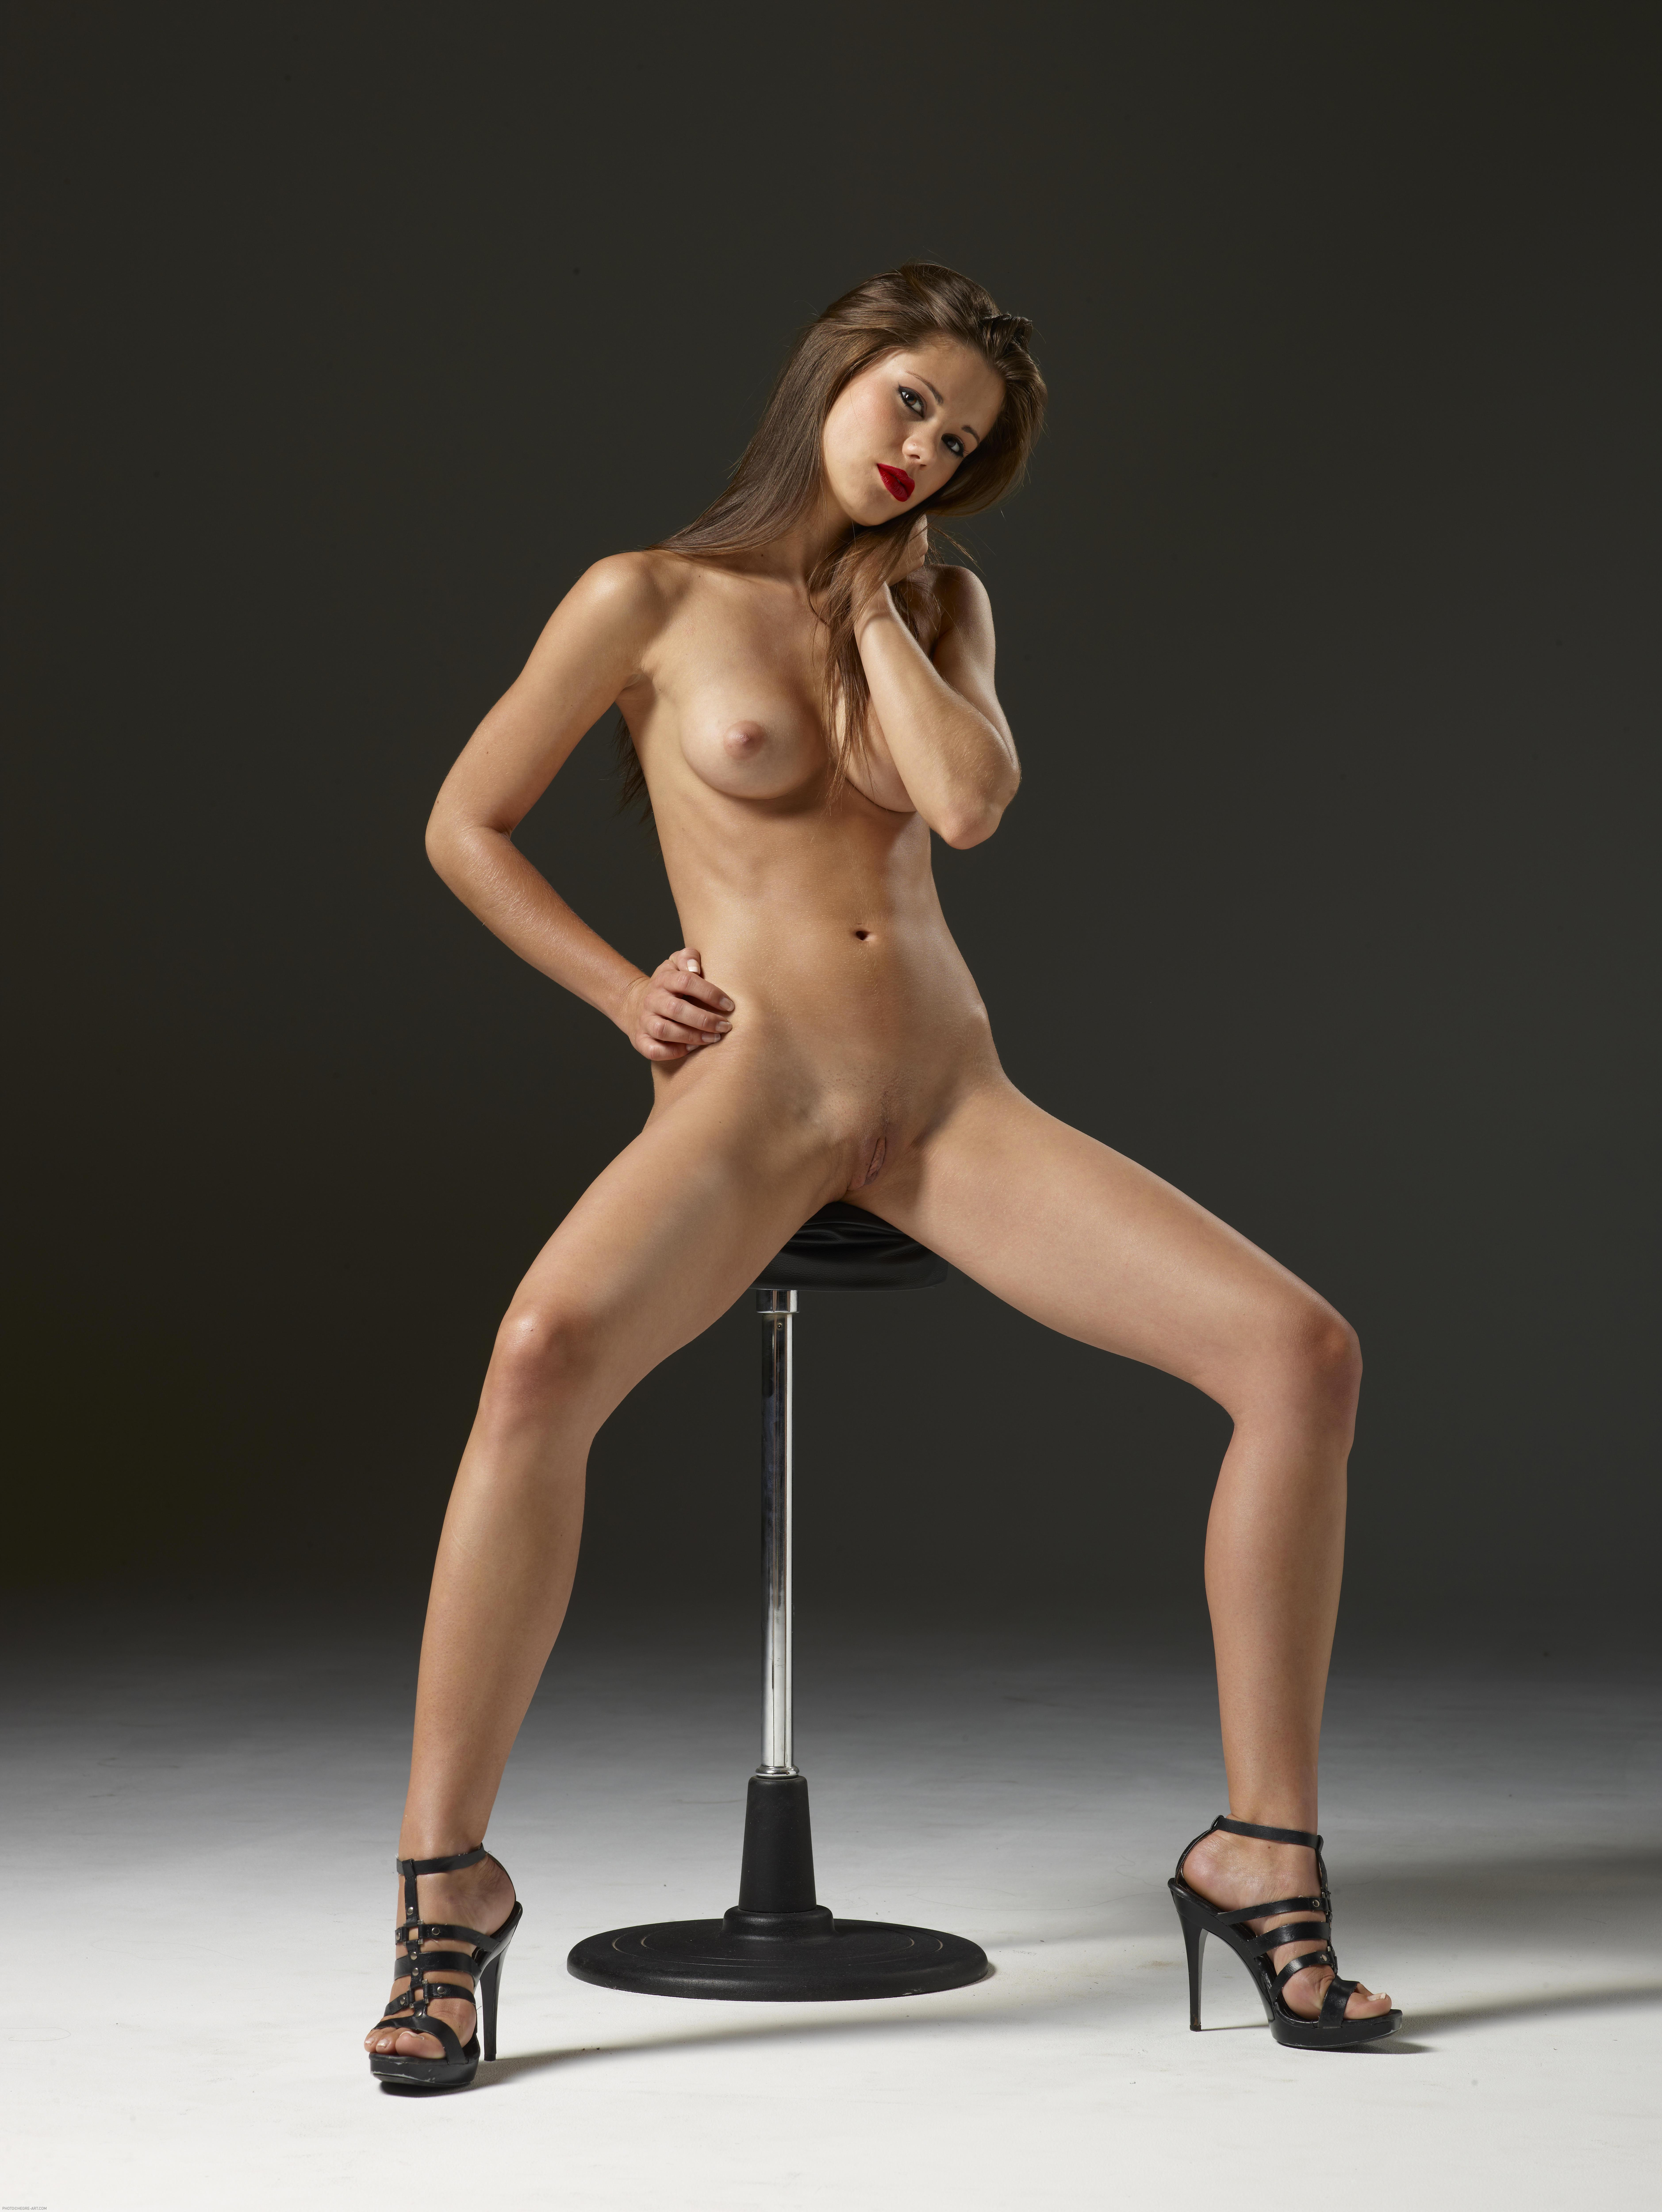 girls-naked-high-heels-pussy-mix-vol2-55